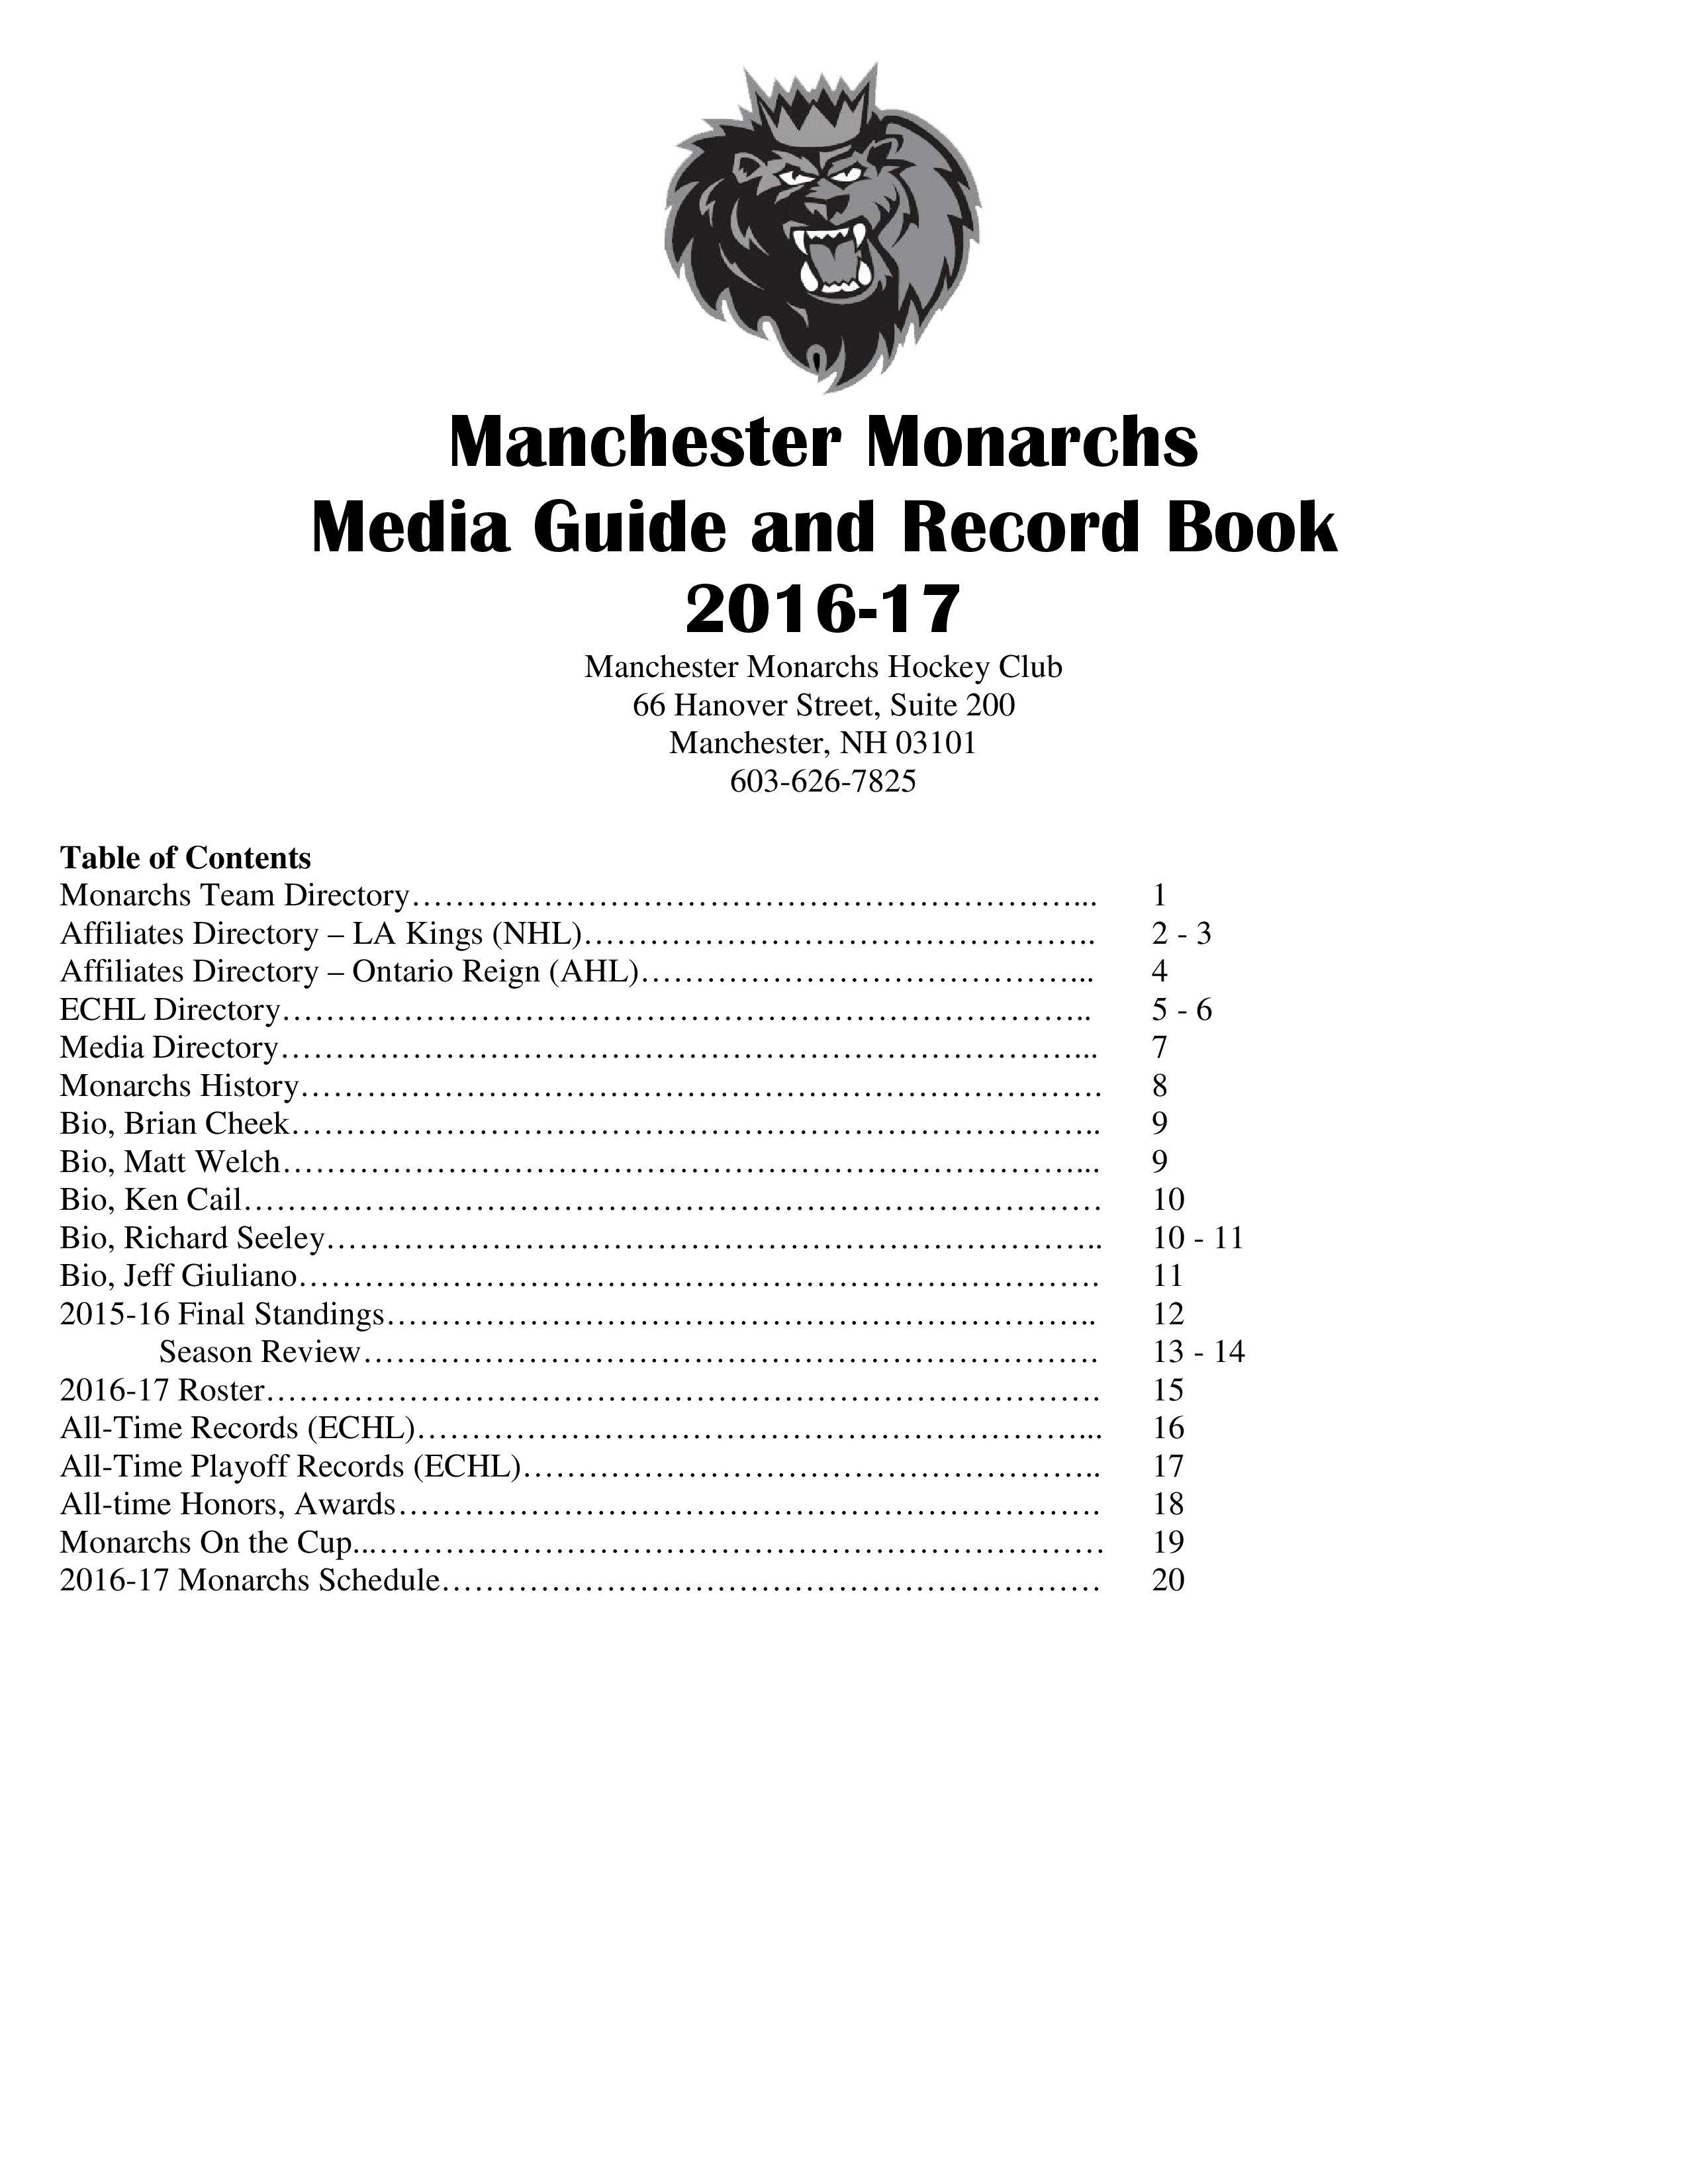 Manchester Monarchs: Media Guide